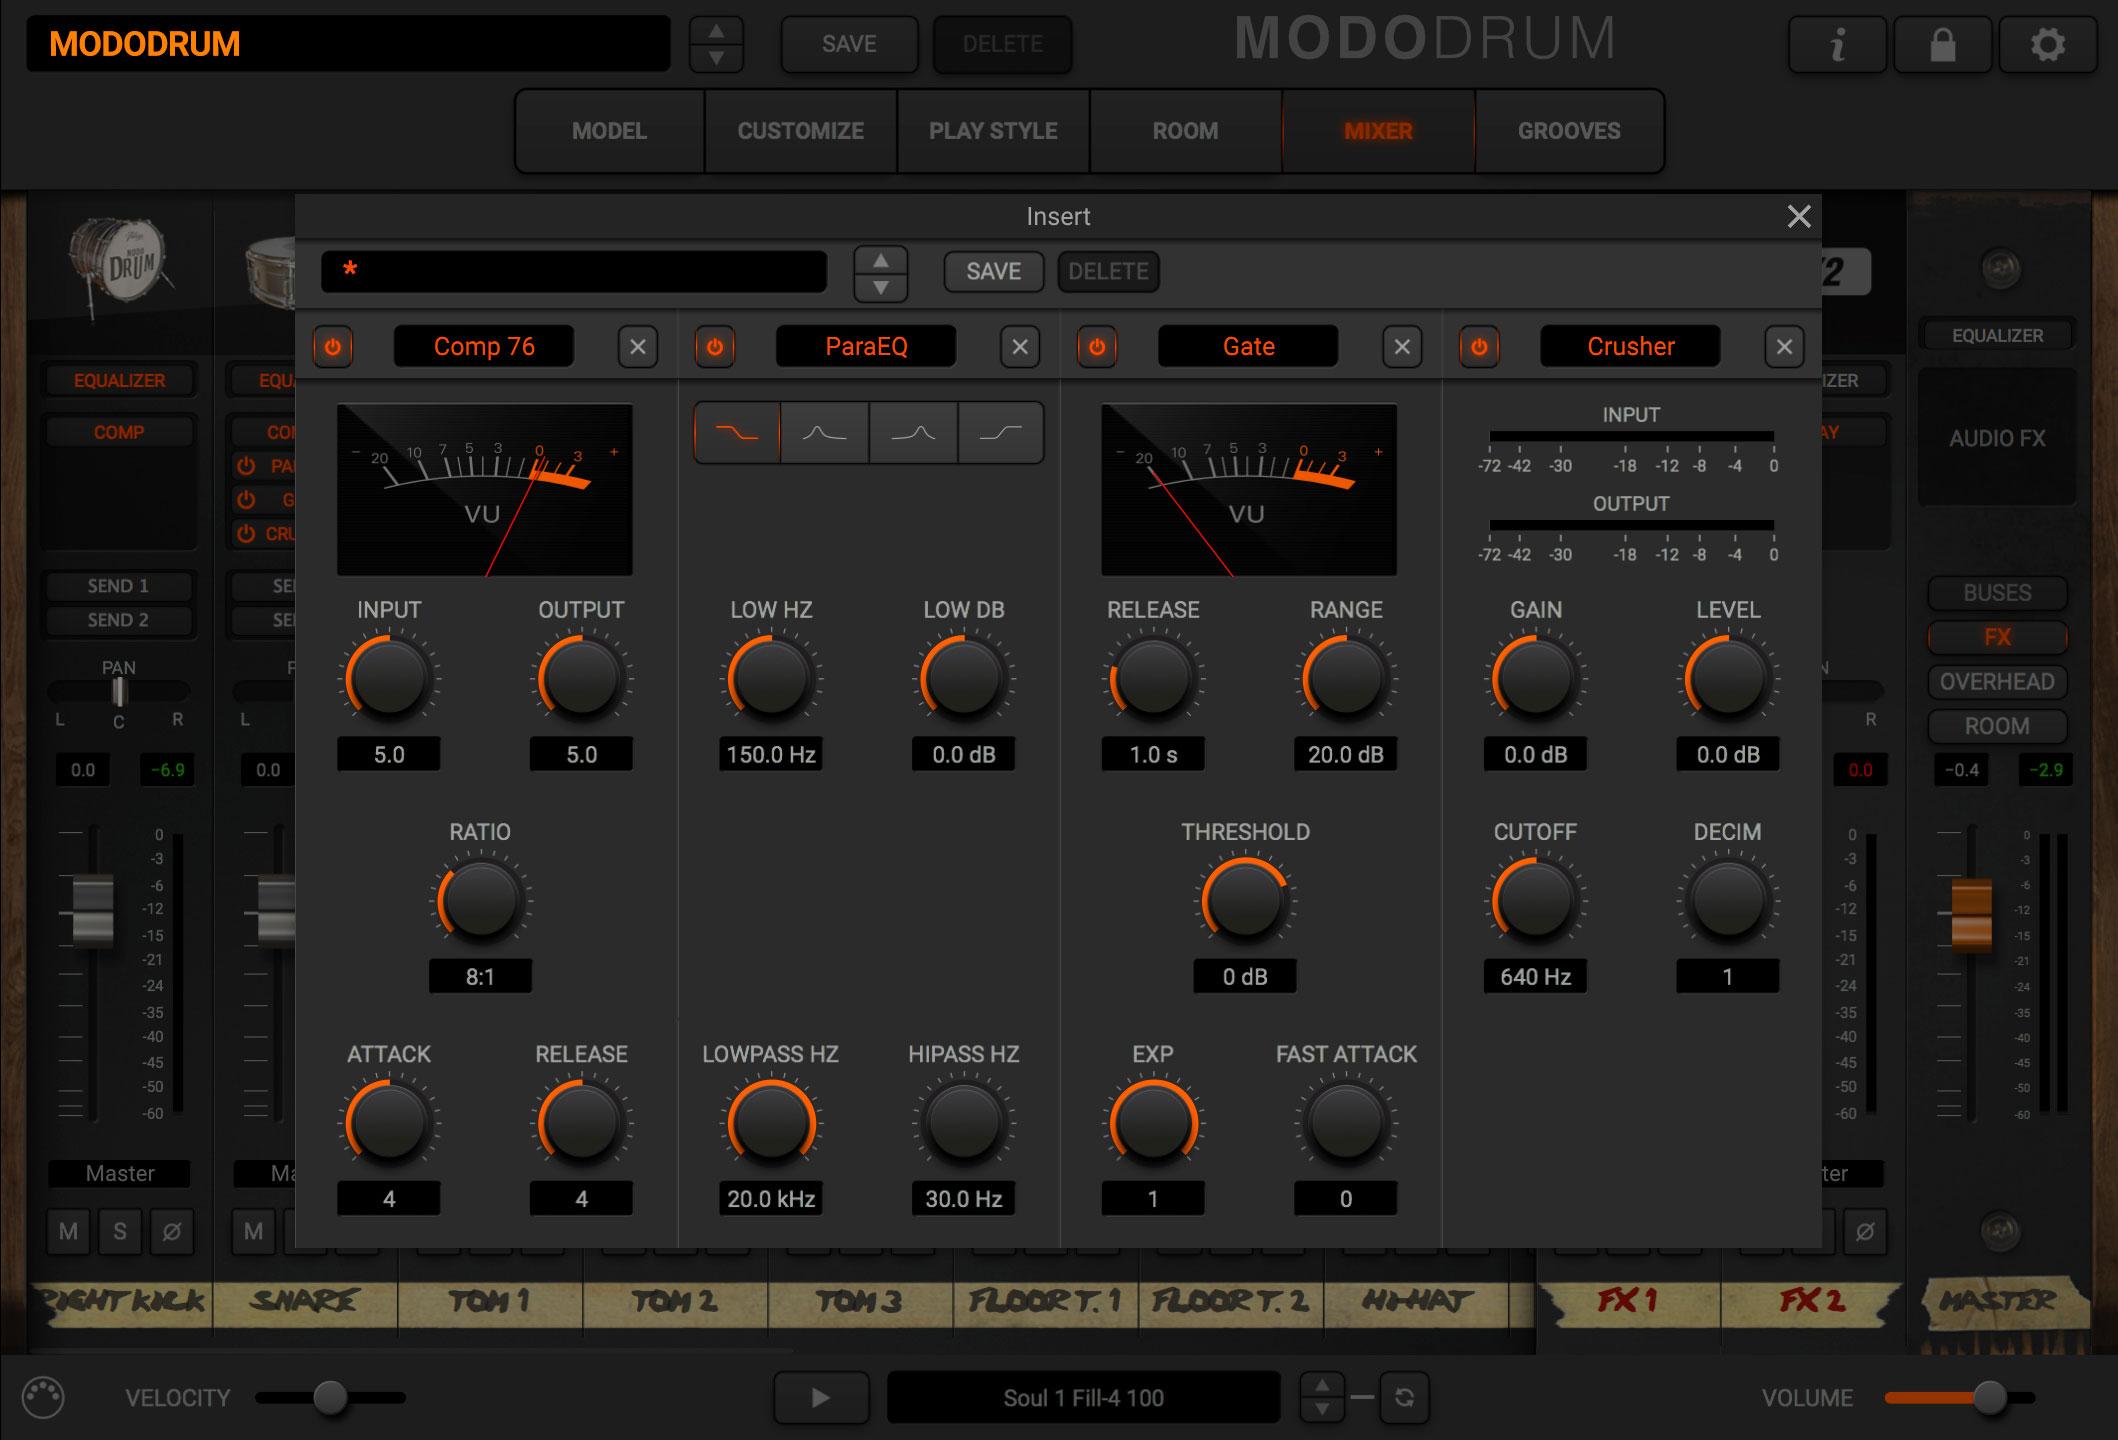 KVR: MODO Drum by IK Multimedia - Drum Collection VST Plugin, Audio